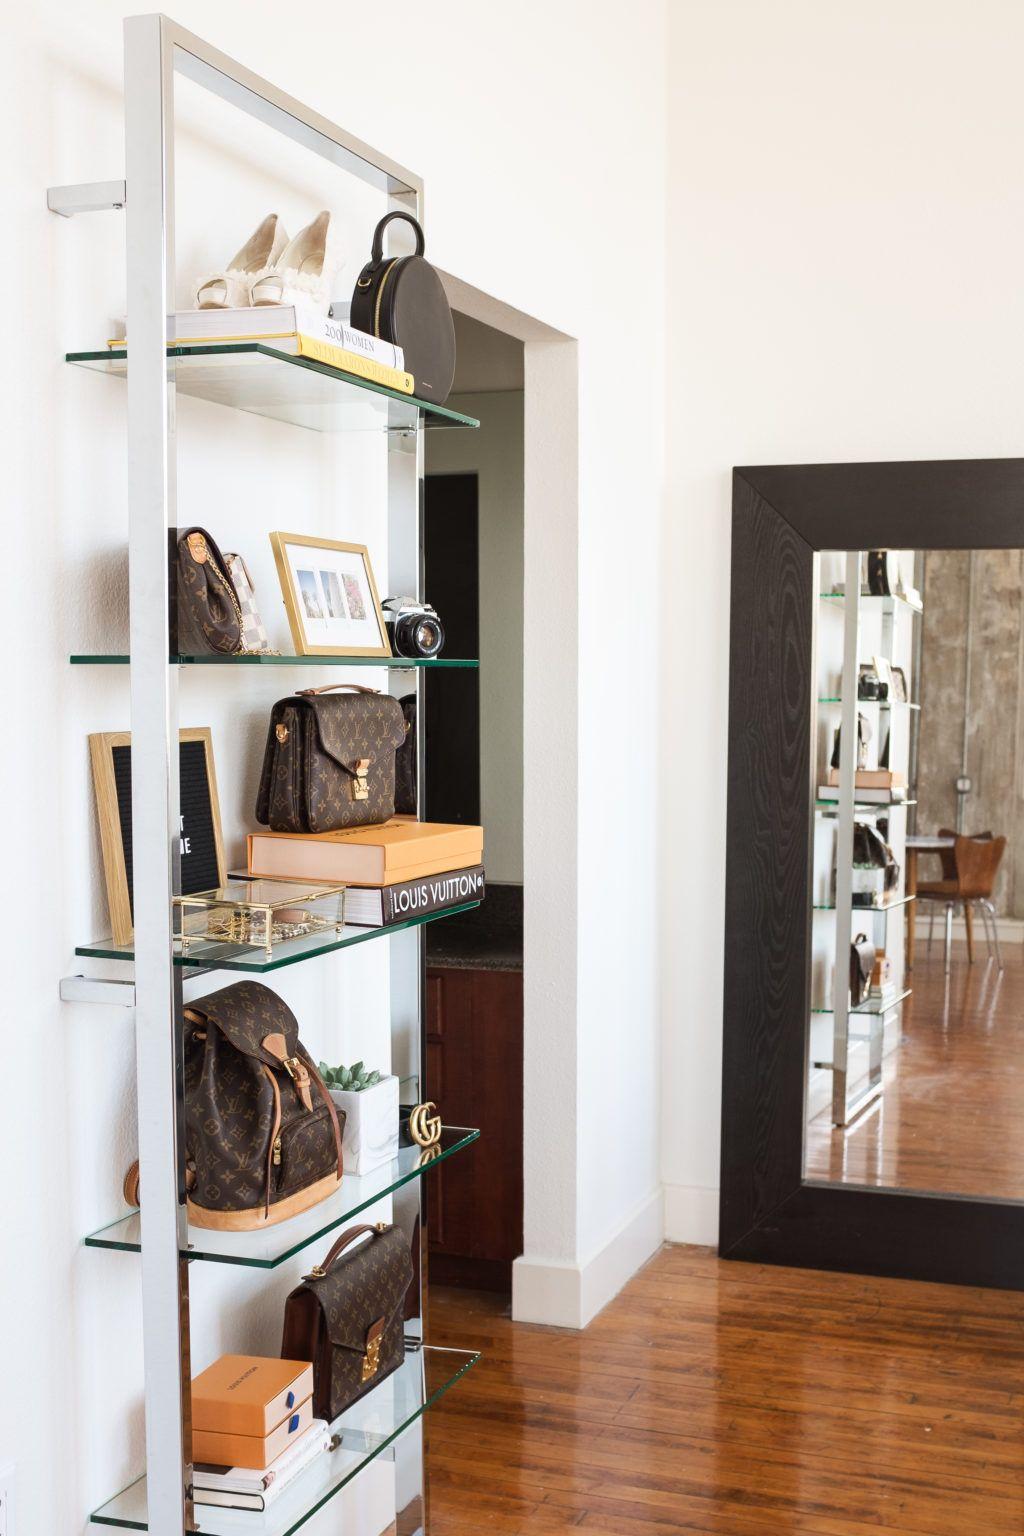 Cb2 tesso chrome bookcase styling apartment interior